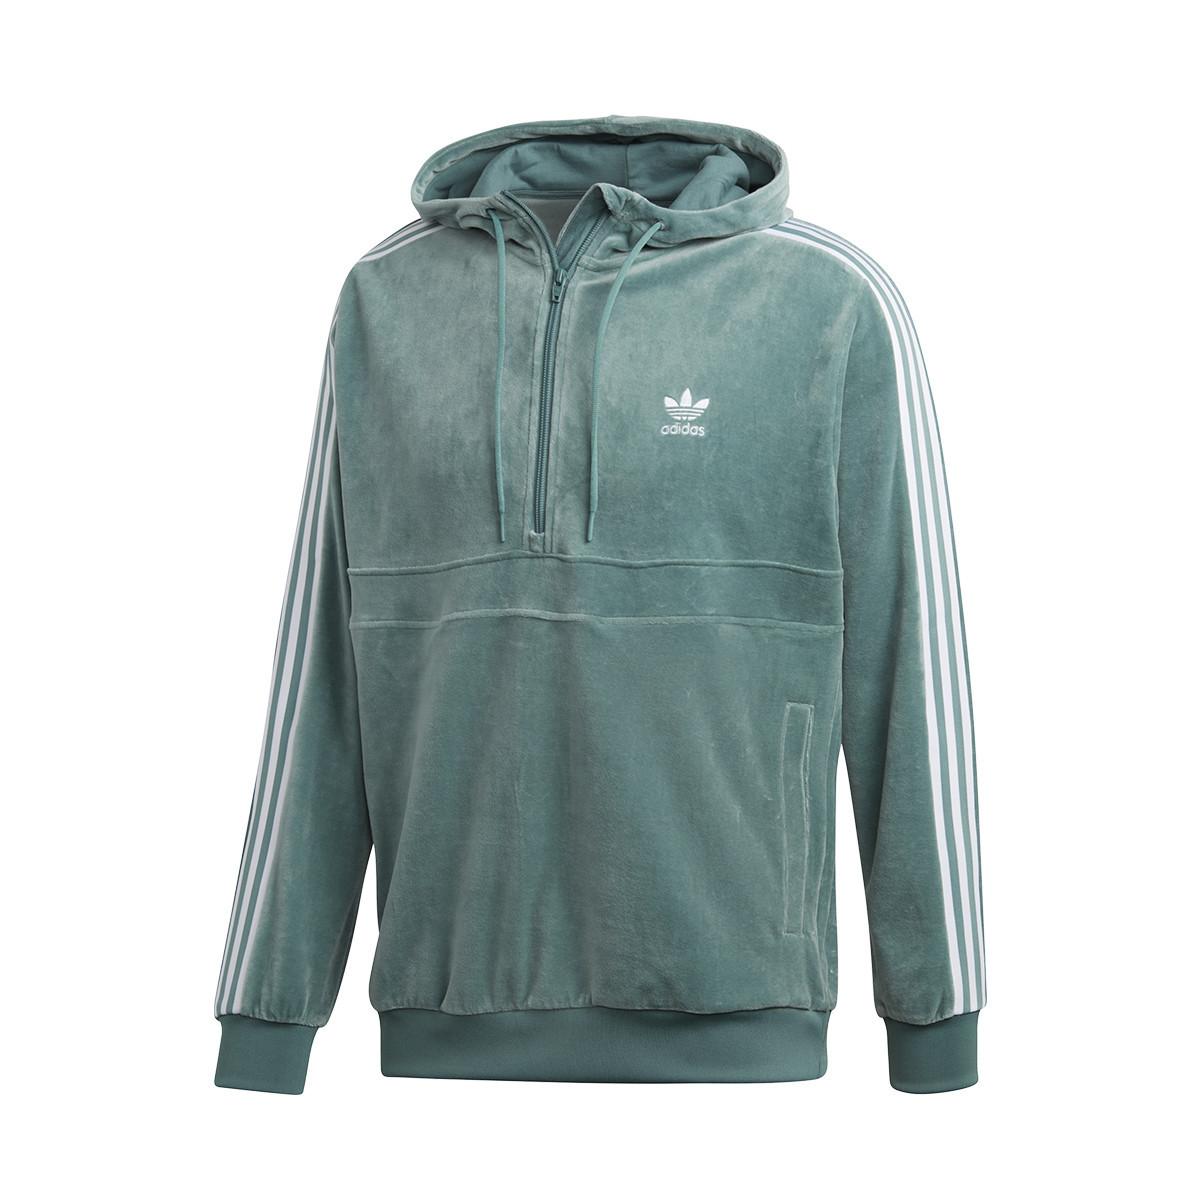 Originals Dv1624 Capuche Halfzip Adidas Sweat Cozy Wopxnznk08 kXZiTPulwO